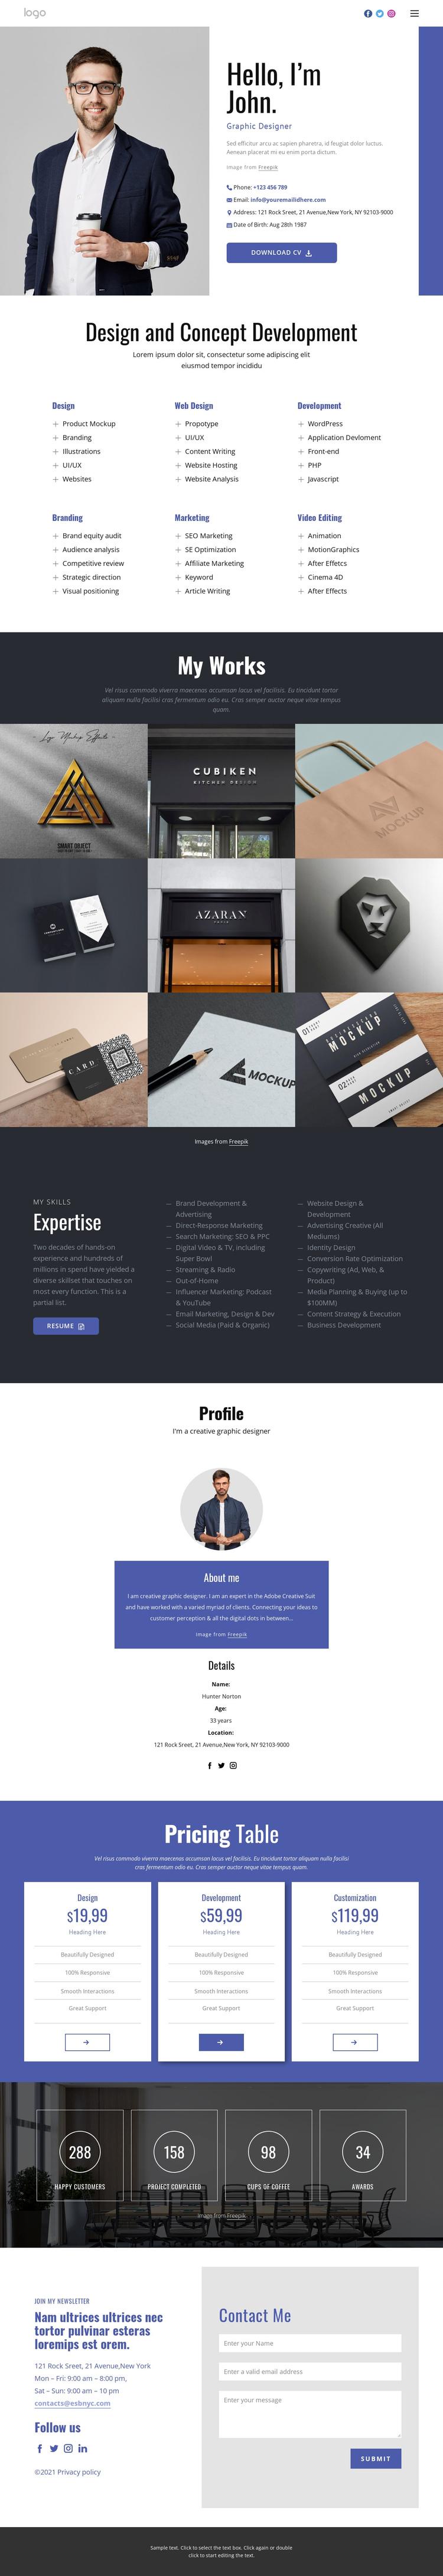 Conceptual design Website Builder Software